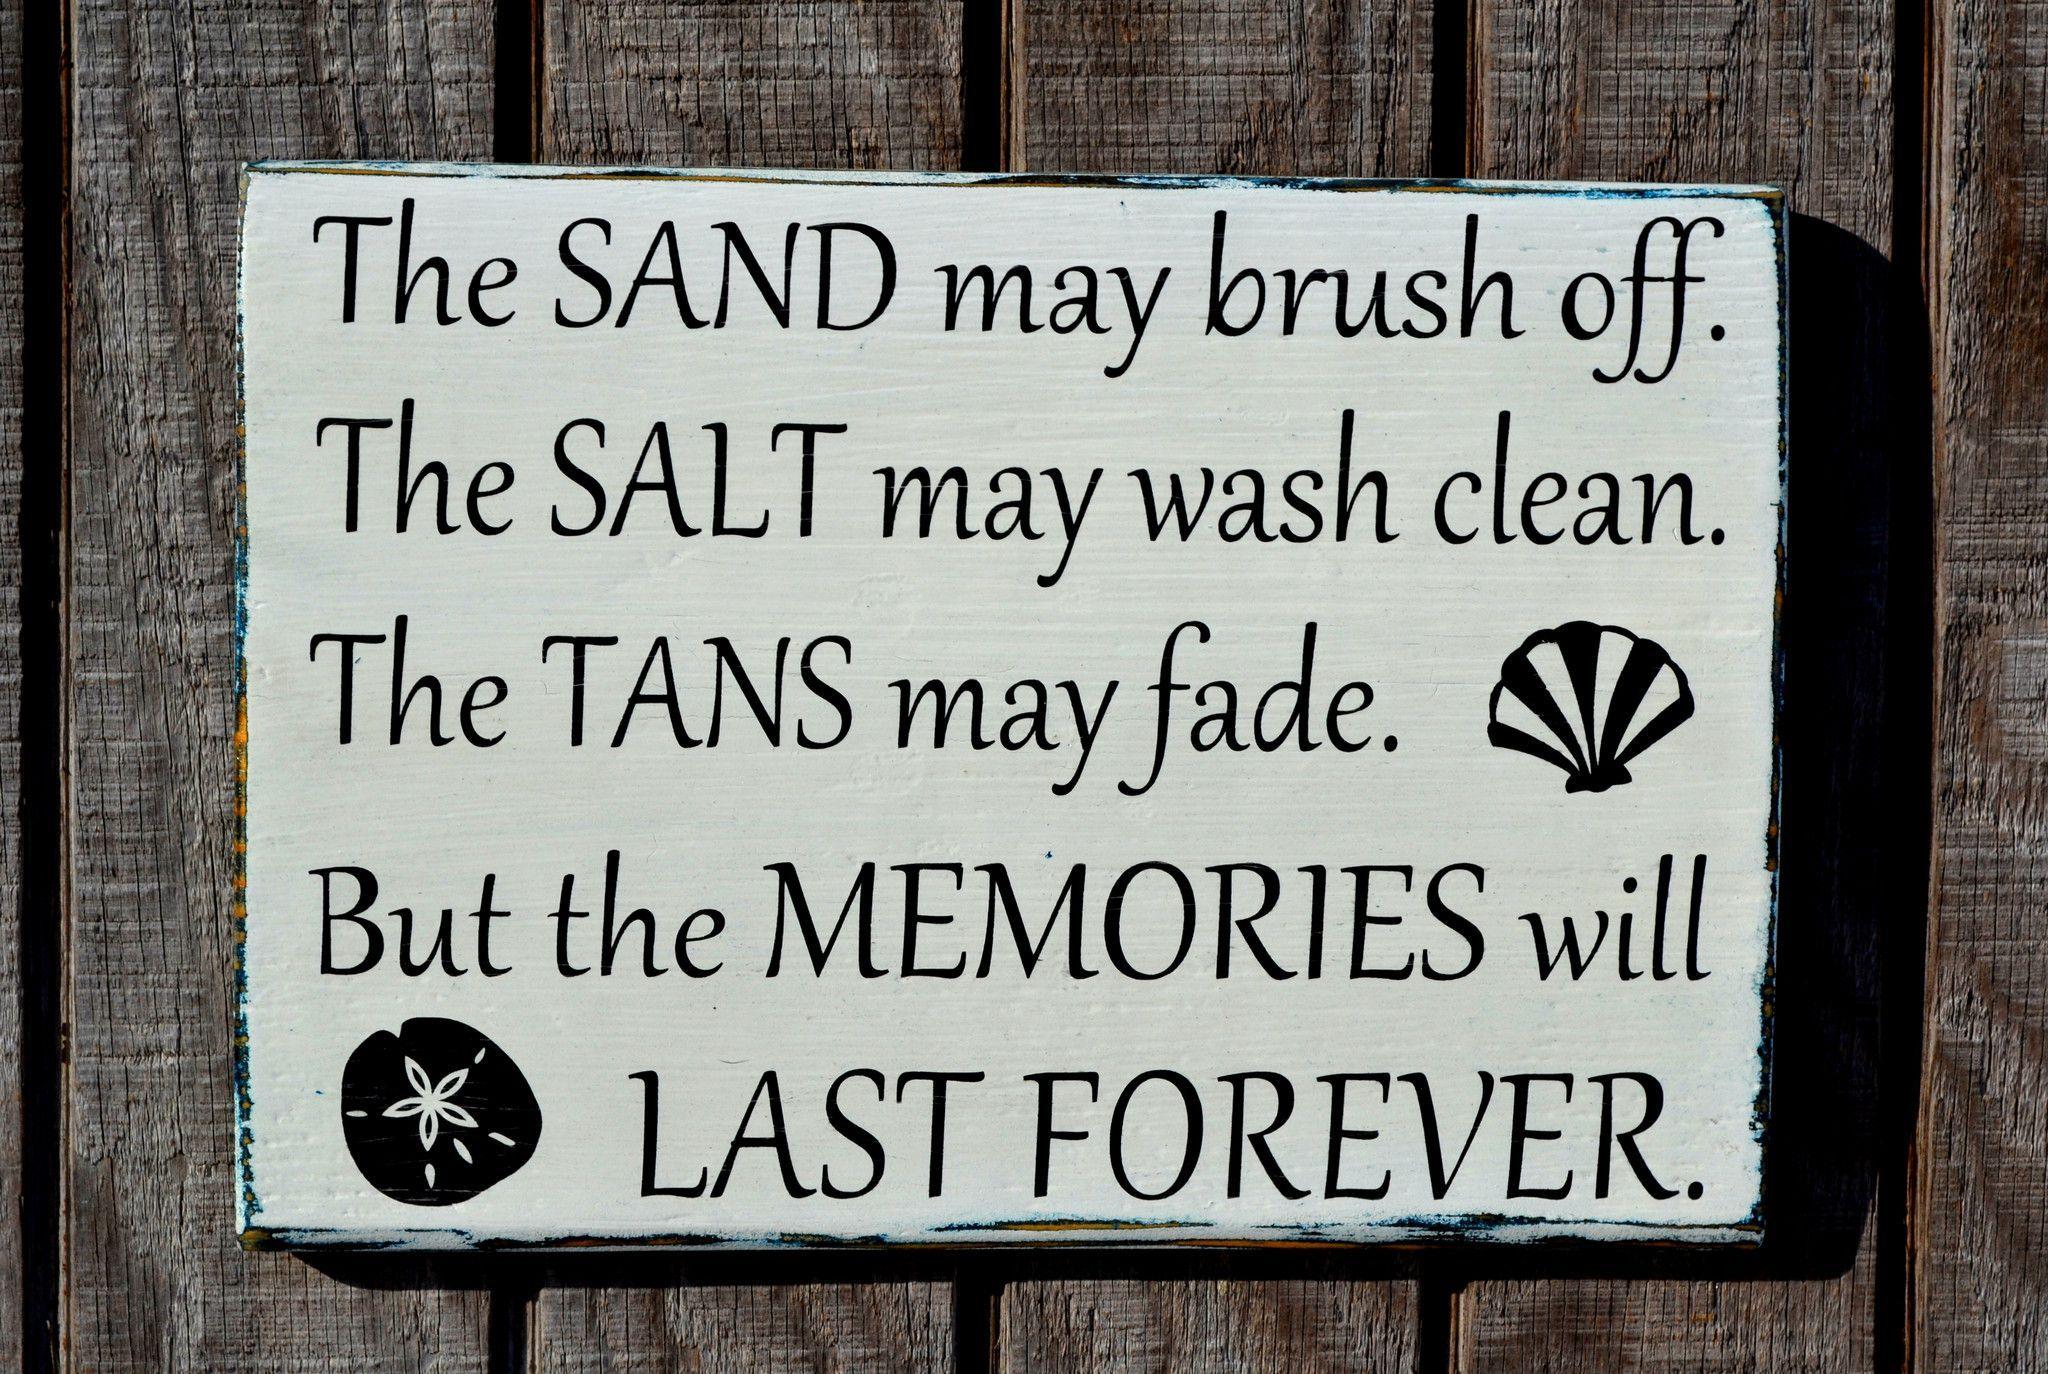 Salt May Brush Off, Tans May Fade - Beach Decor - Beach Signs - Beach Wall Decor - Coastal Decor - Painted, Wood - Beach House